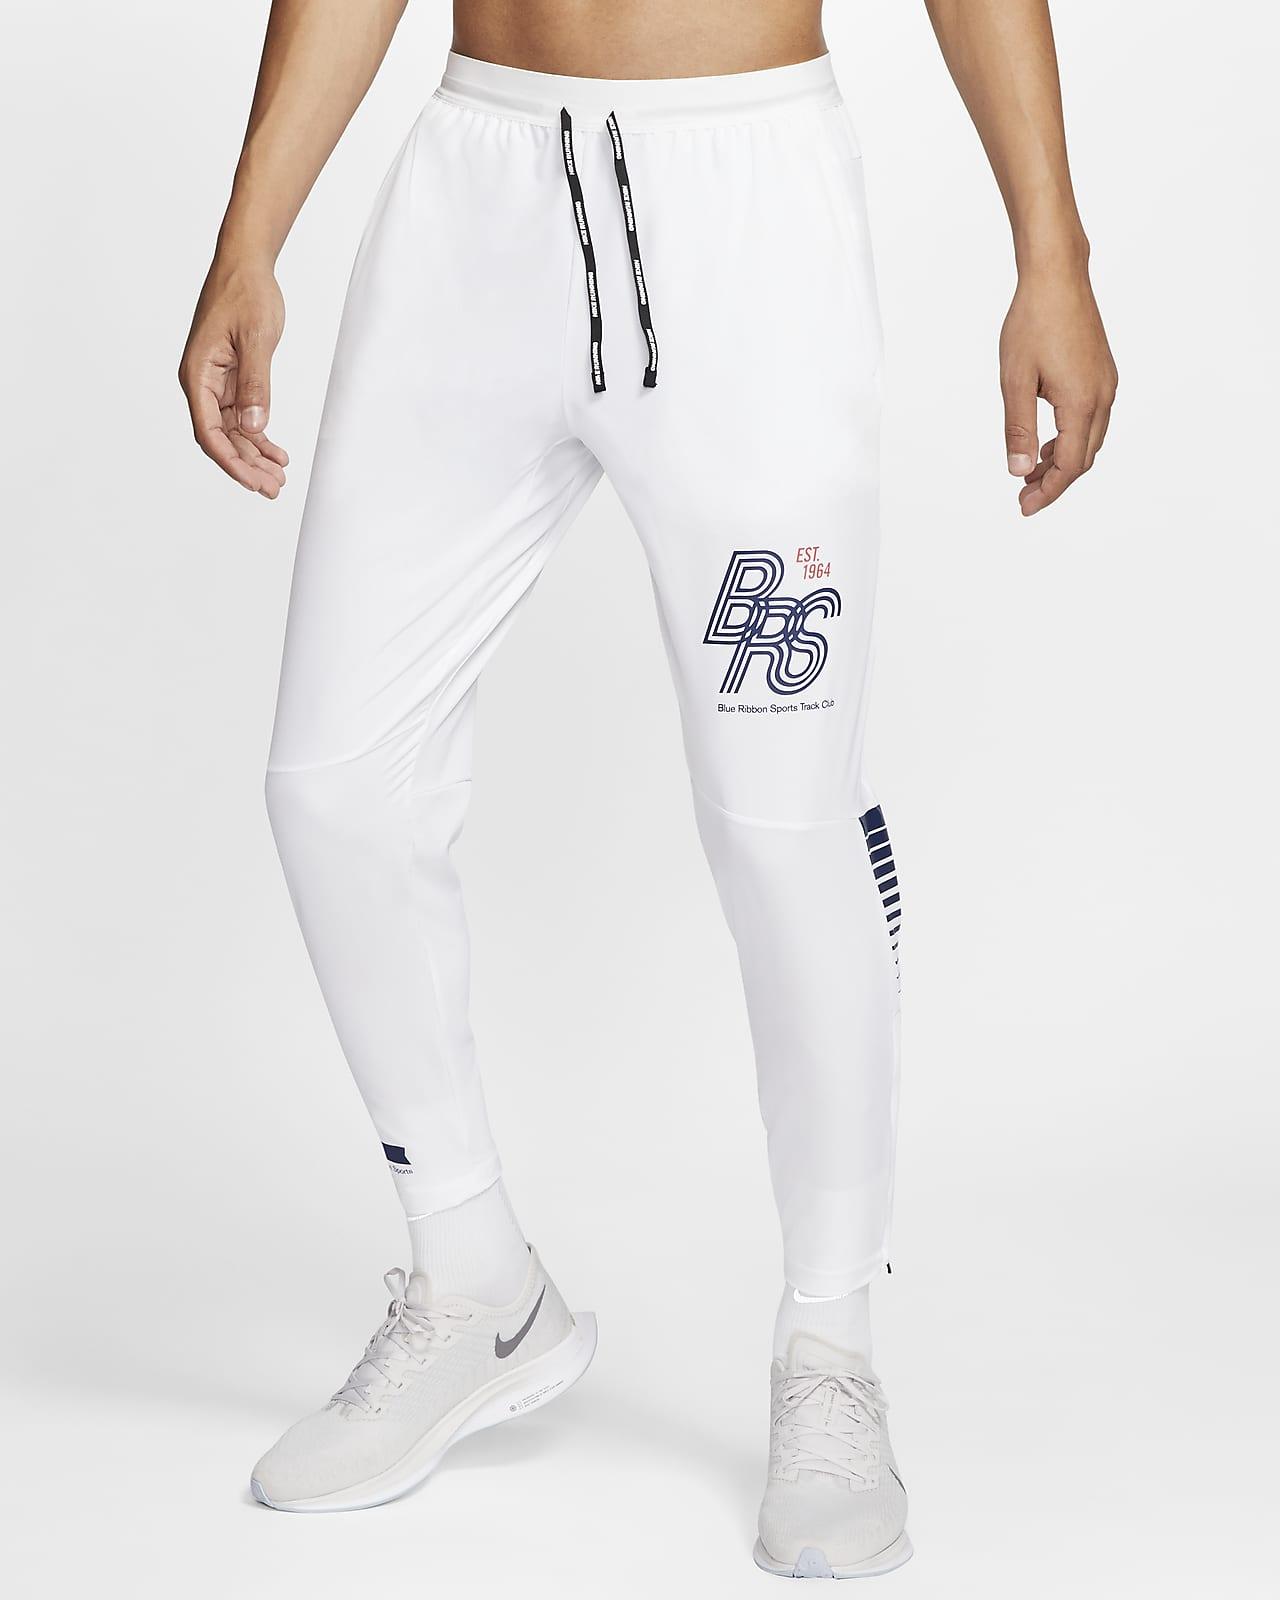 Löparbyxor Nike Blue Ribbon Sports